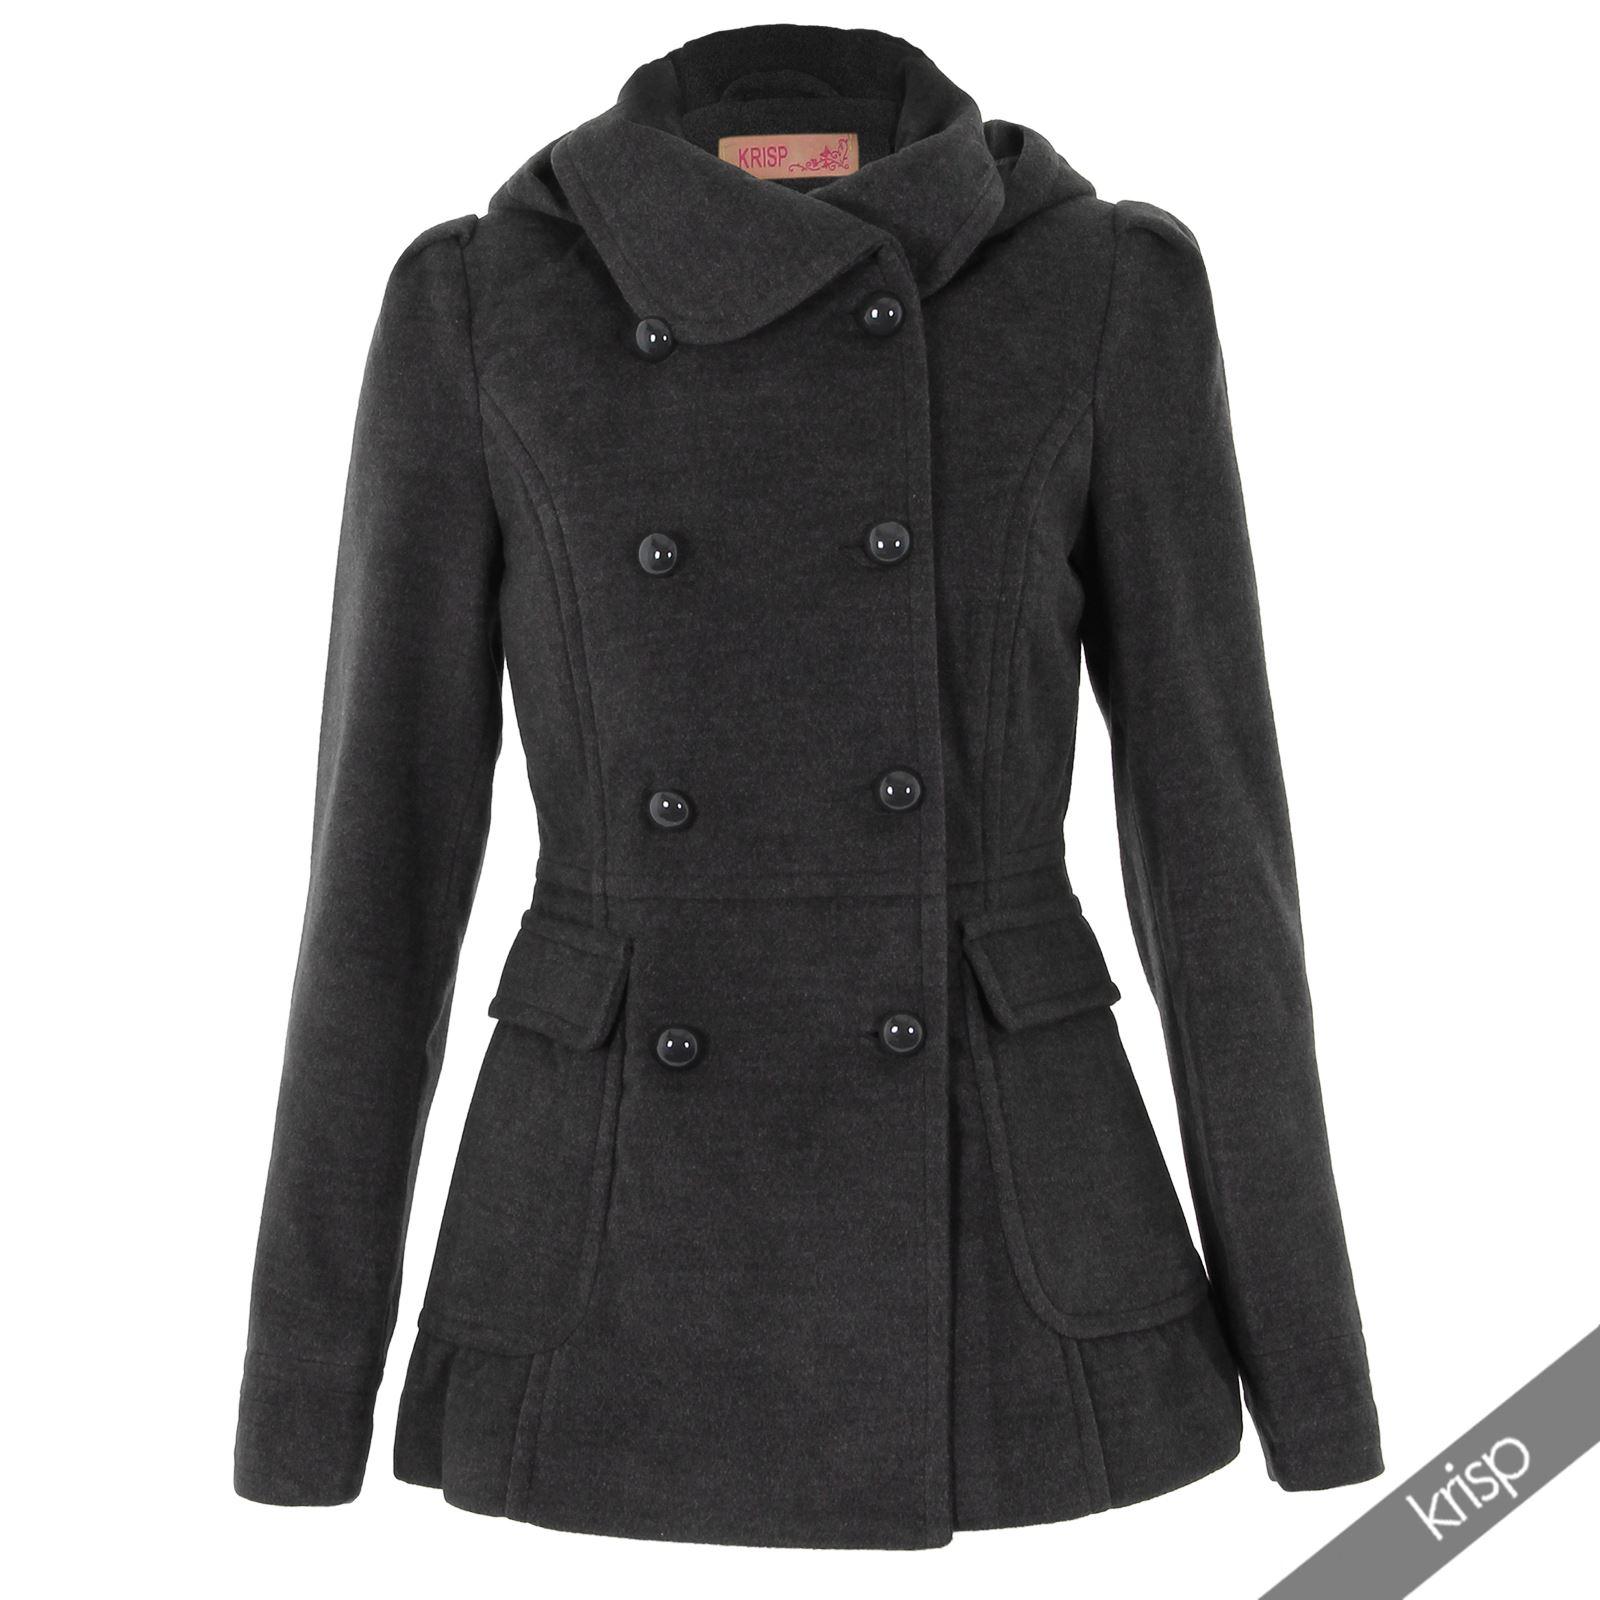 Womens hooded wool coat